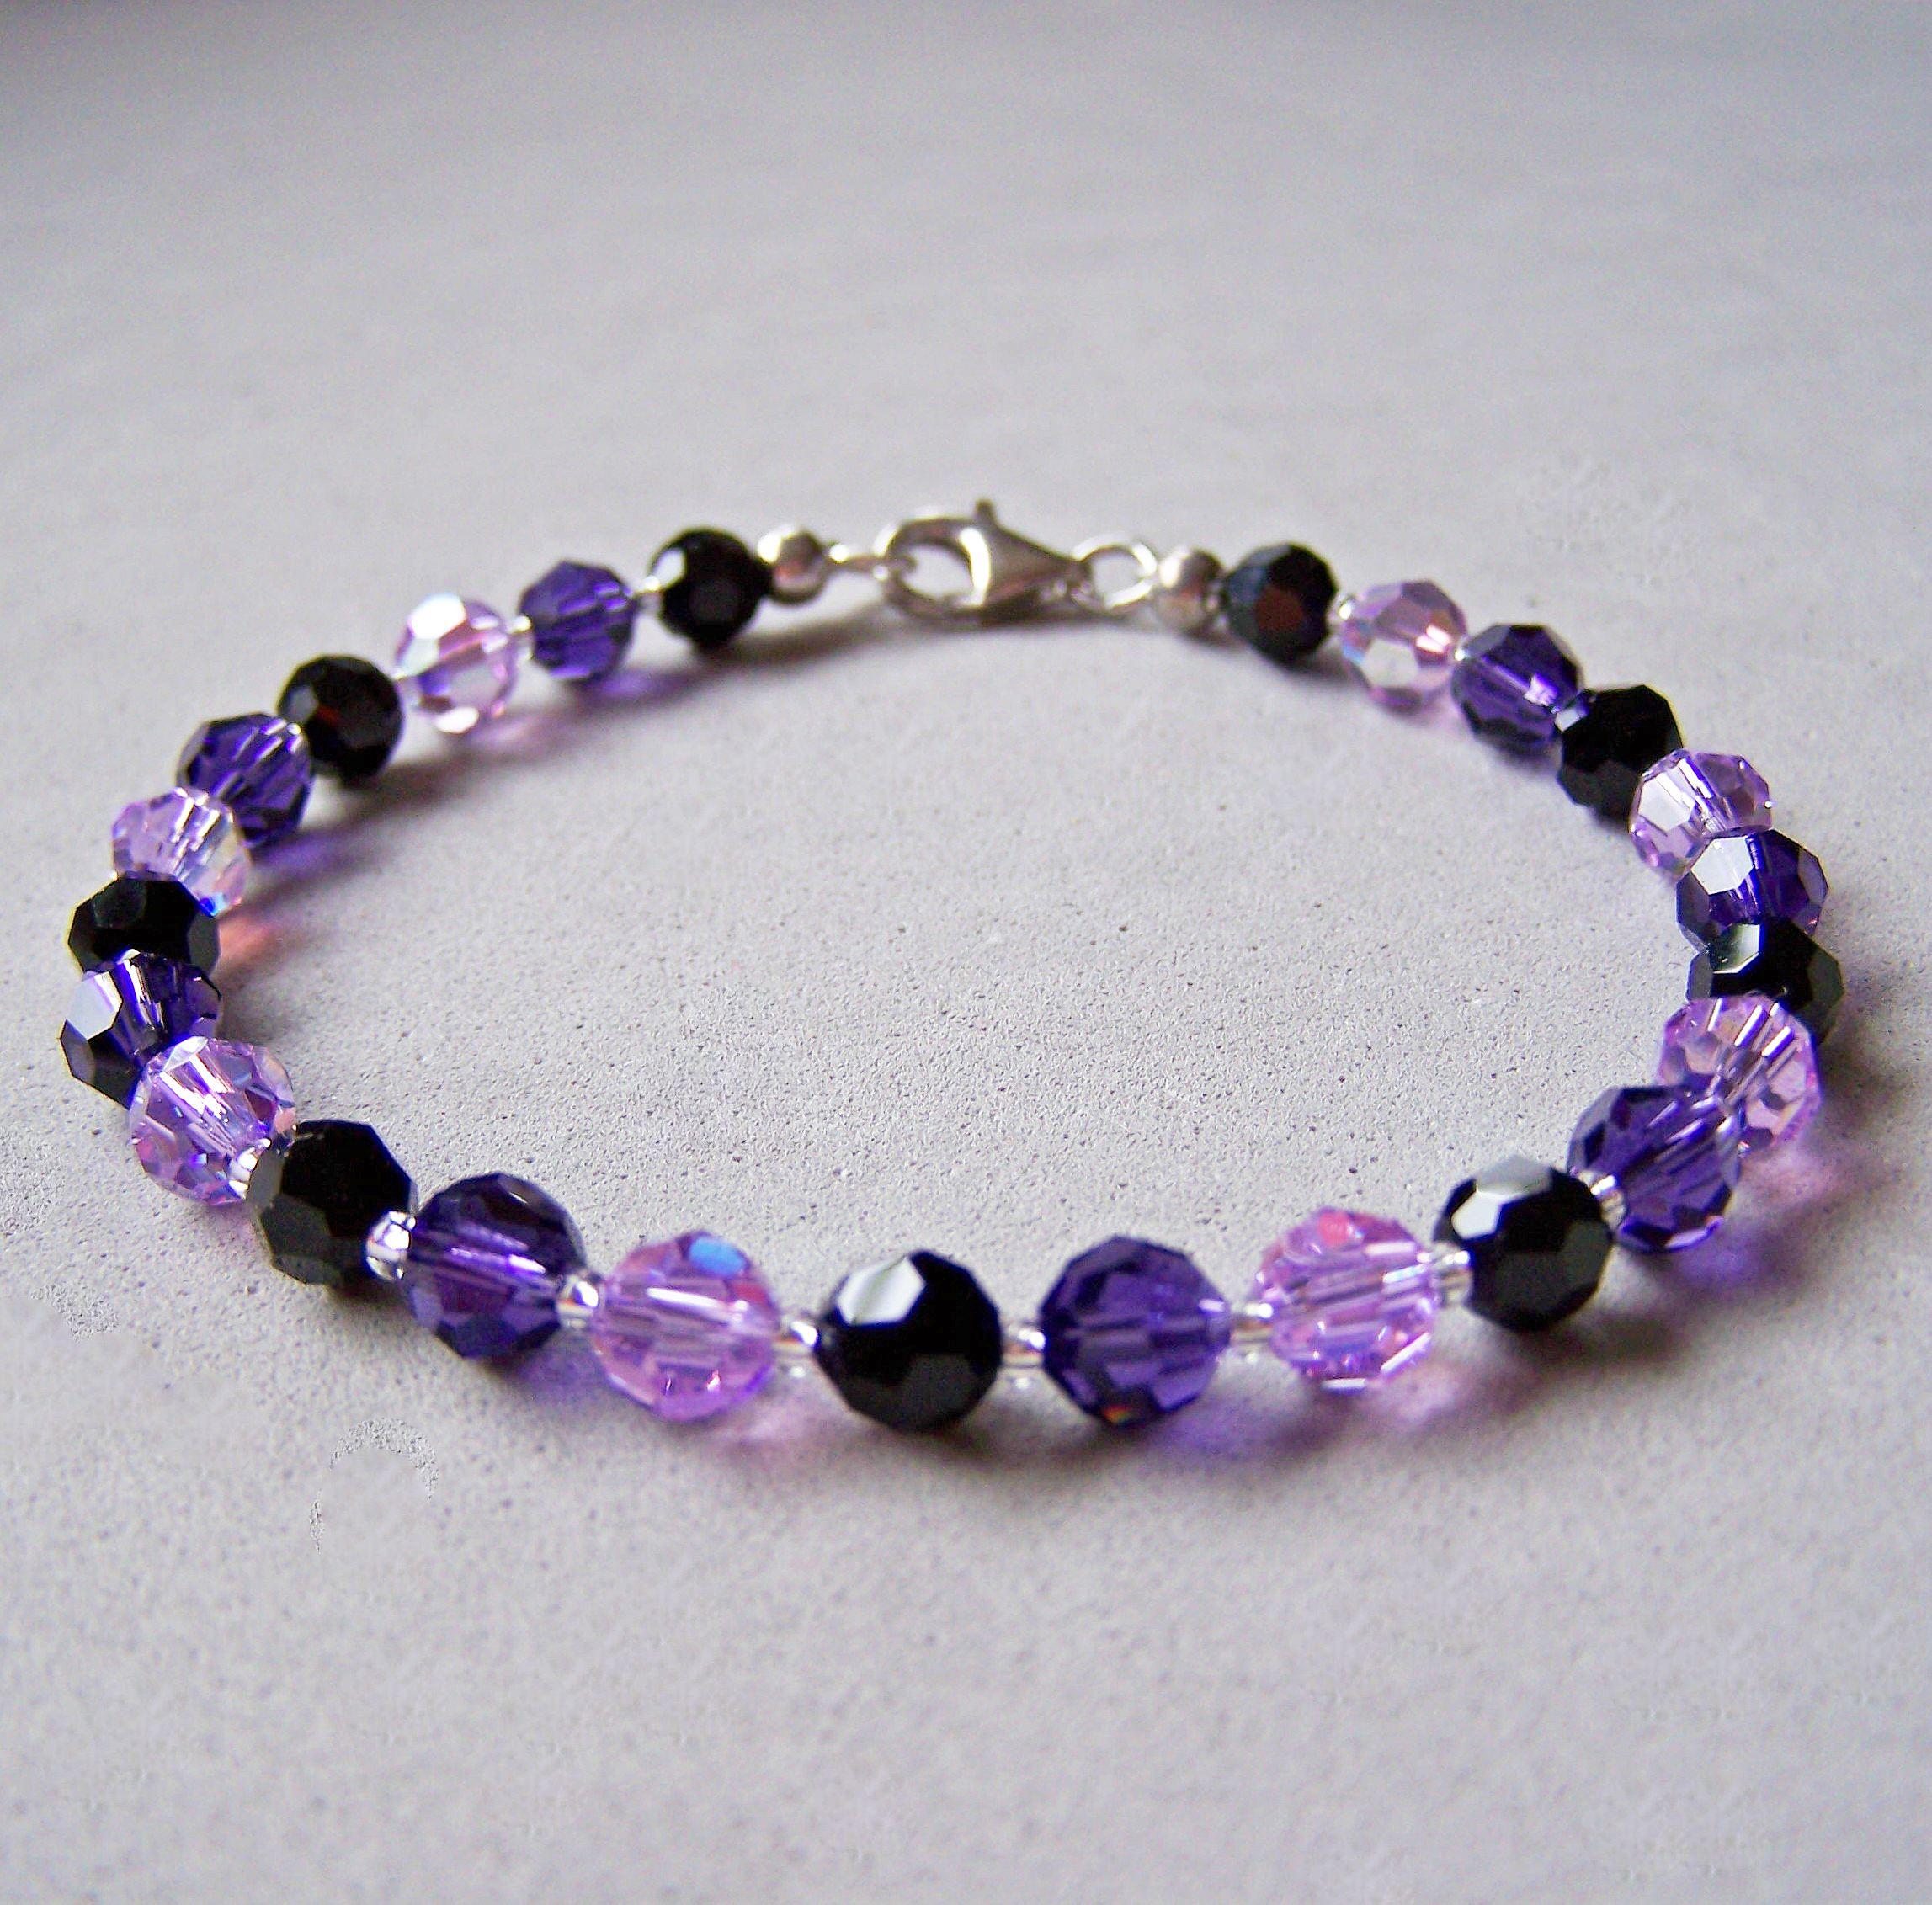 armband aus swarovski kristall perlen 6mm in lila. Black Bedroom Furniture Sets. Home Design Ideas